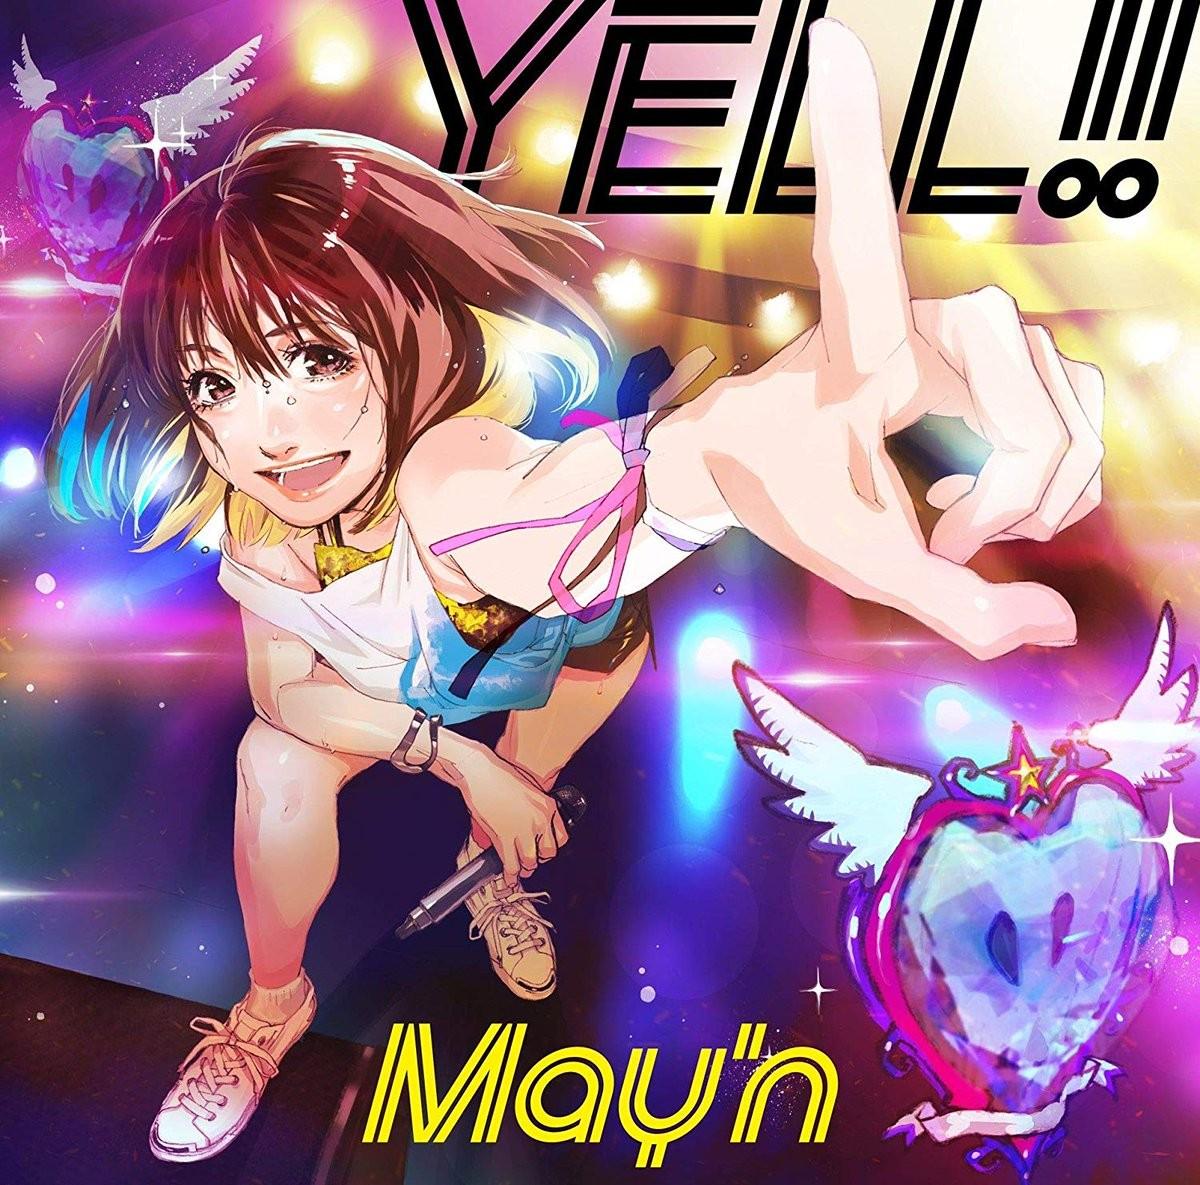 May'n (中林芽依) – YELL!! [Mora FLAC 24bit/48kHz]